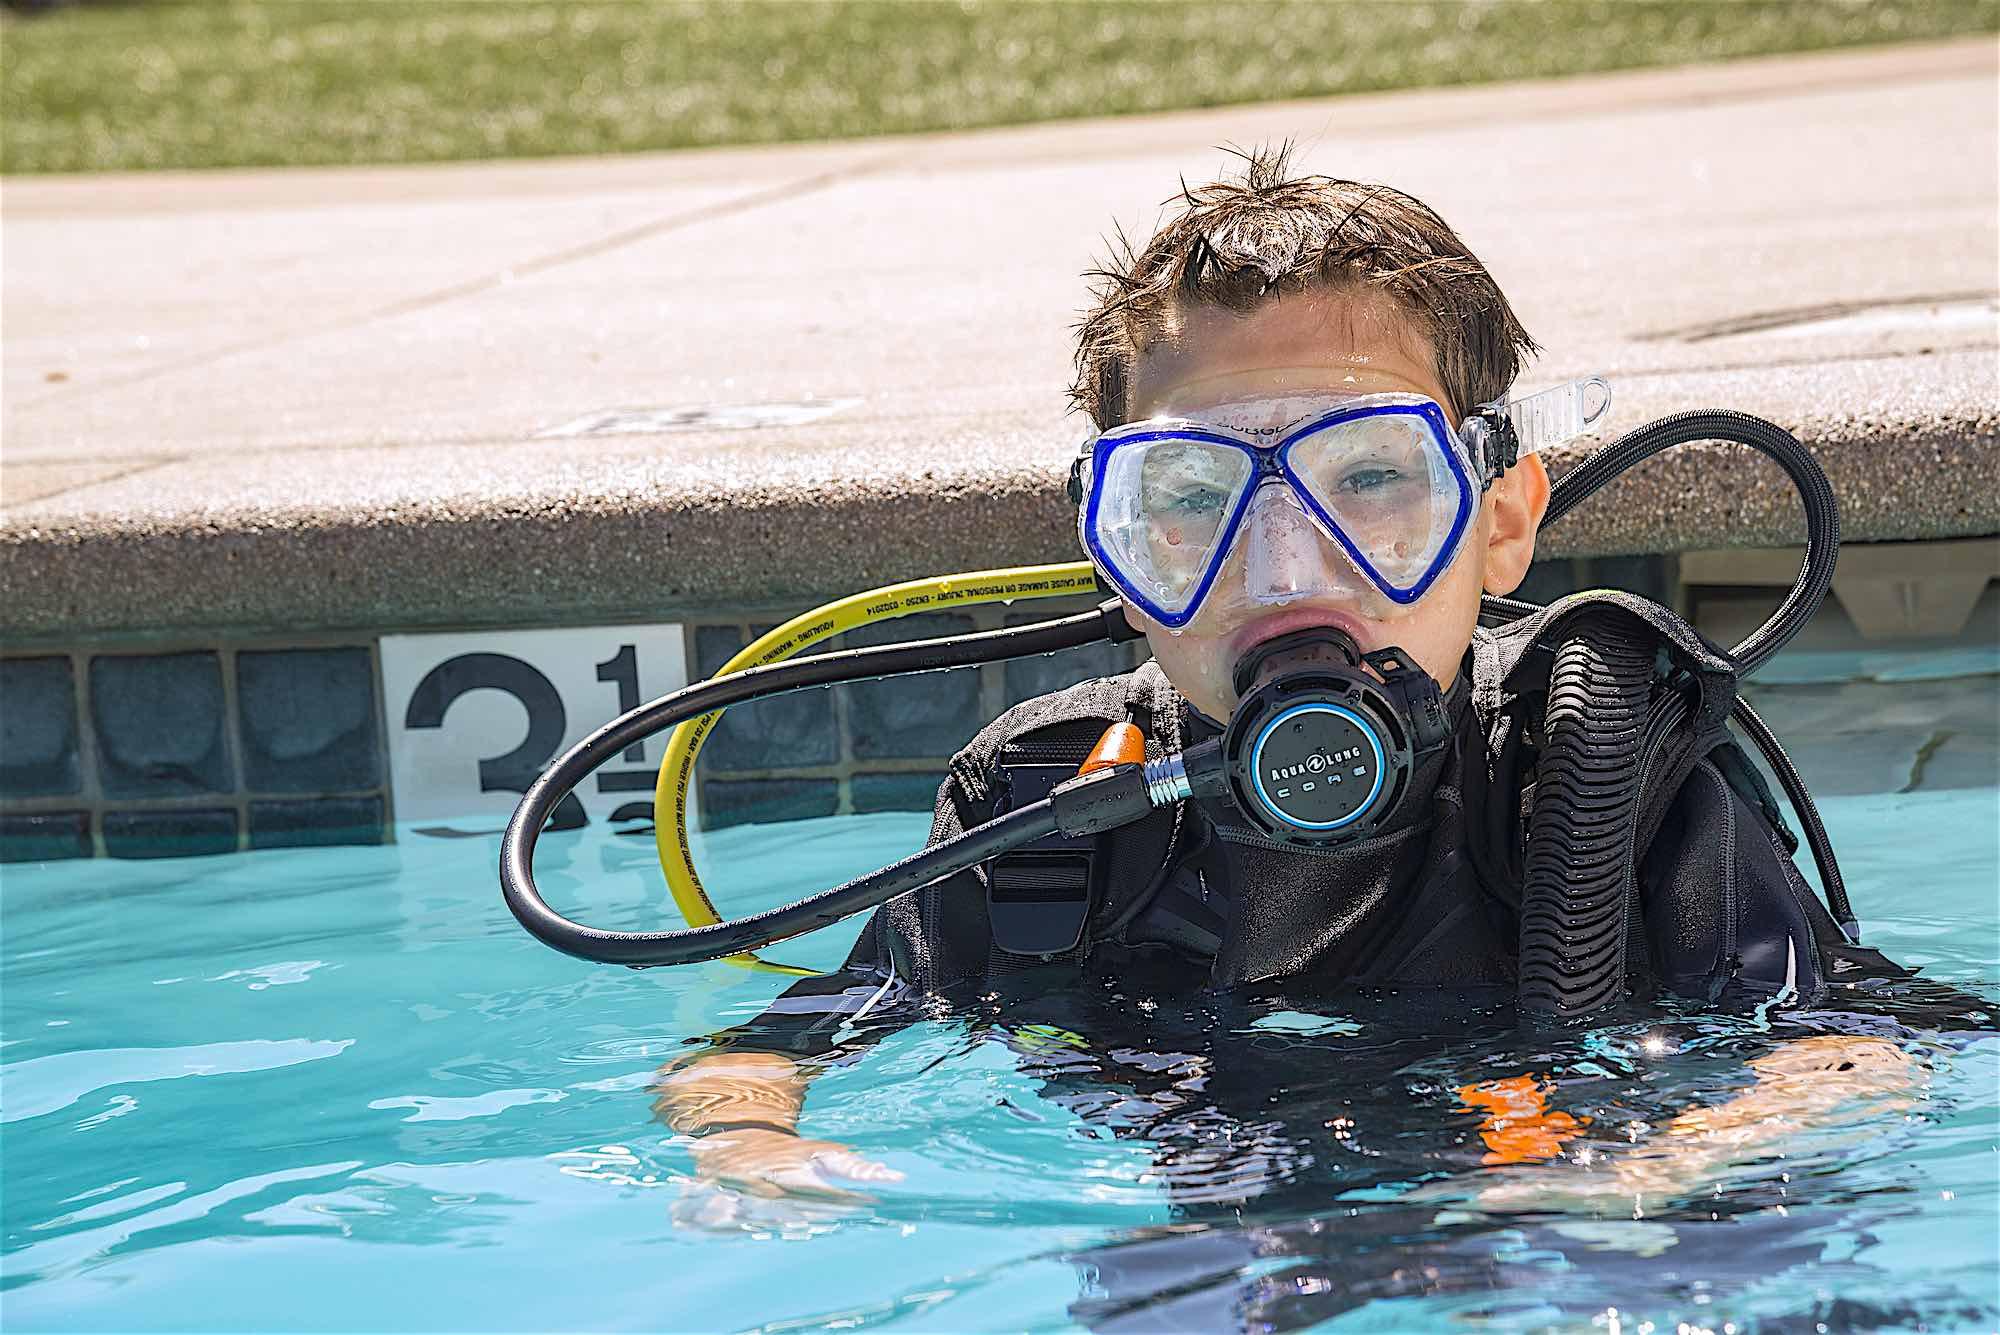 www.thefunkyturtle.com seal team activities scuba diving koh tao